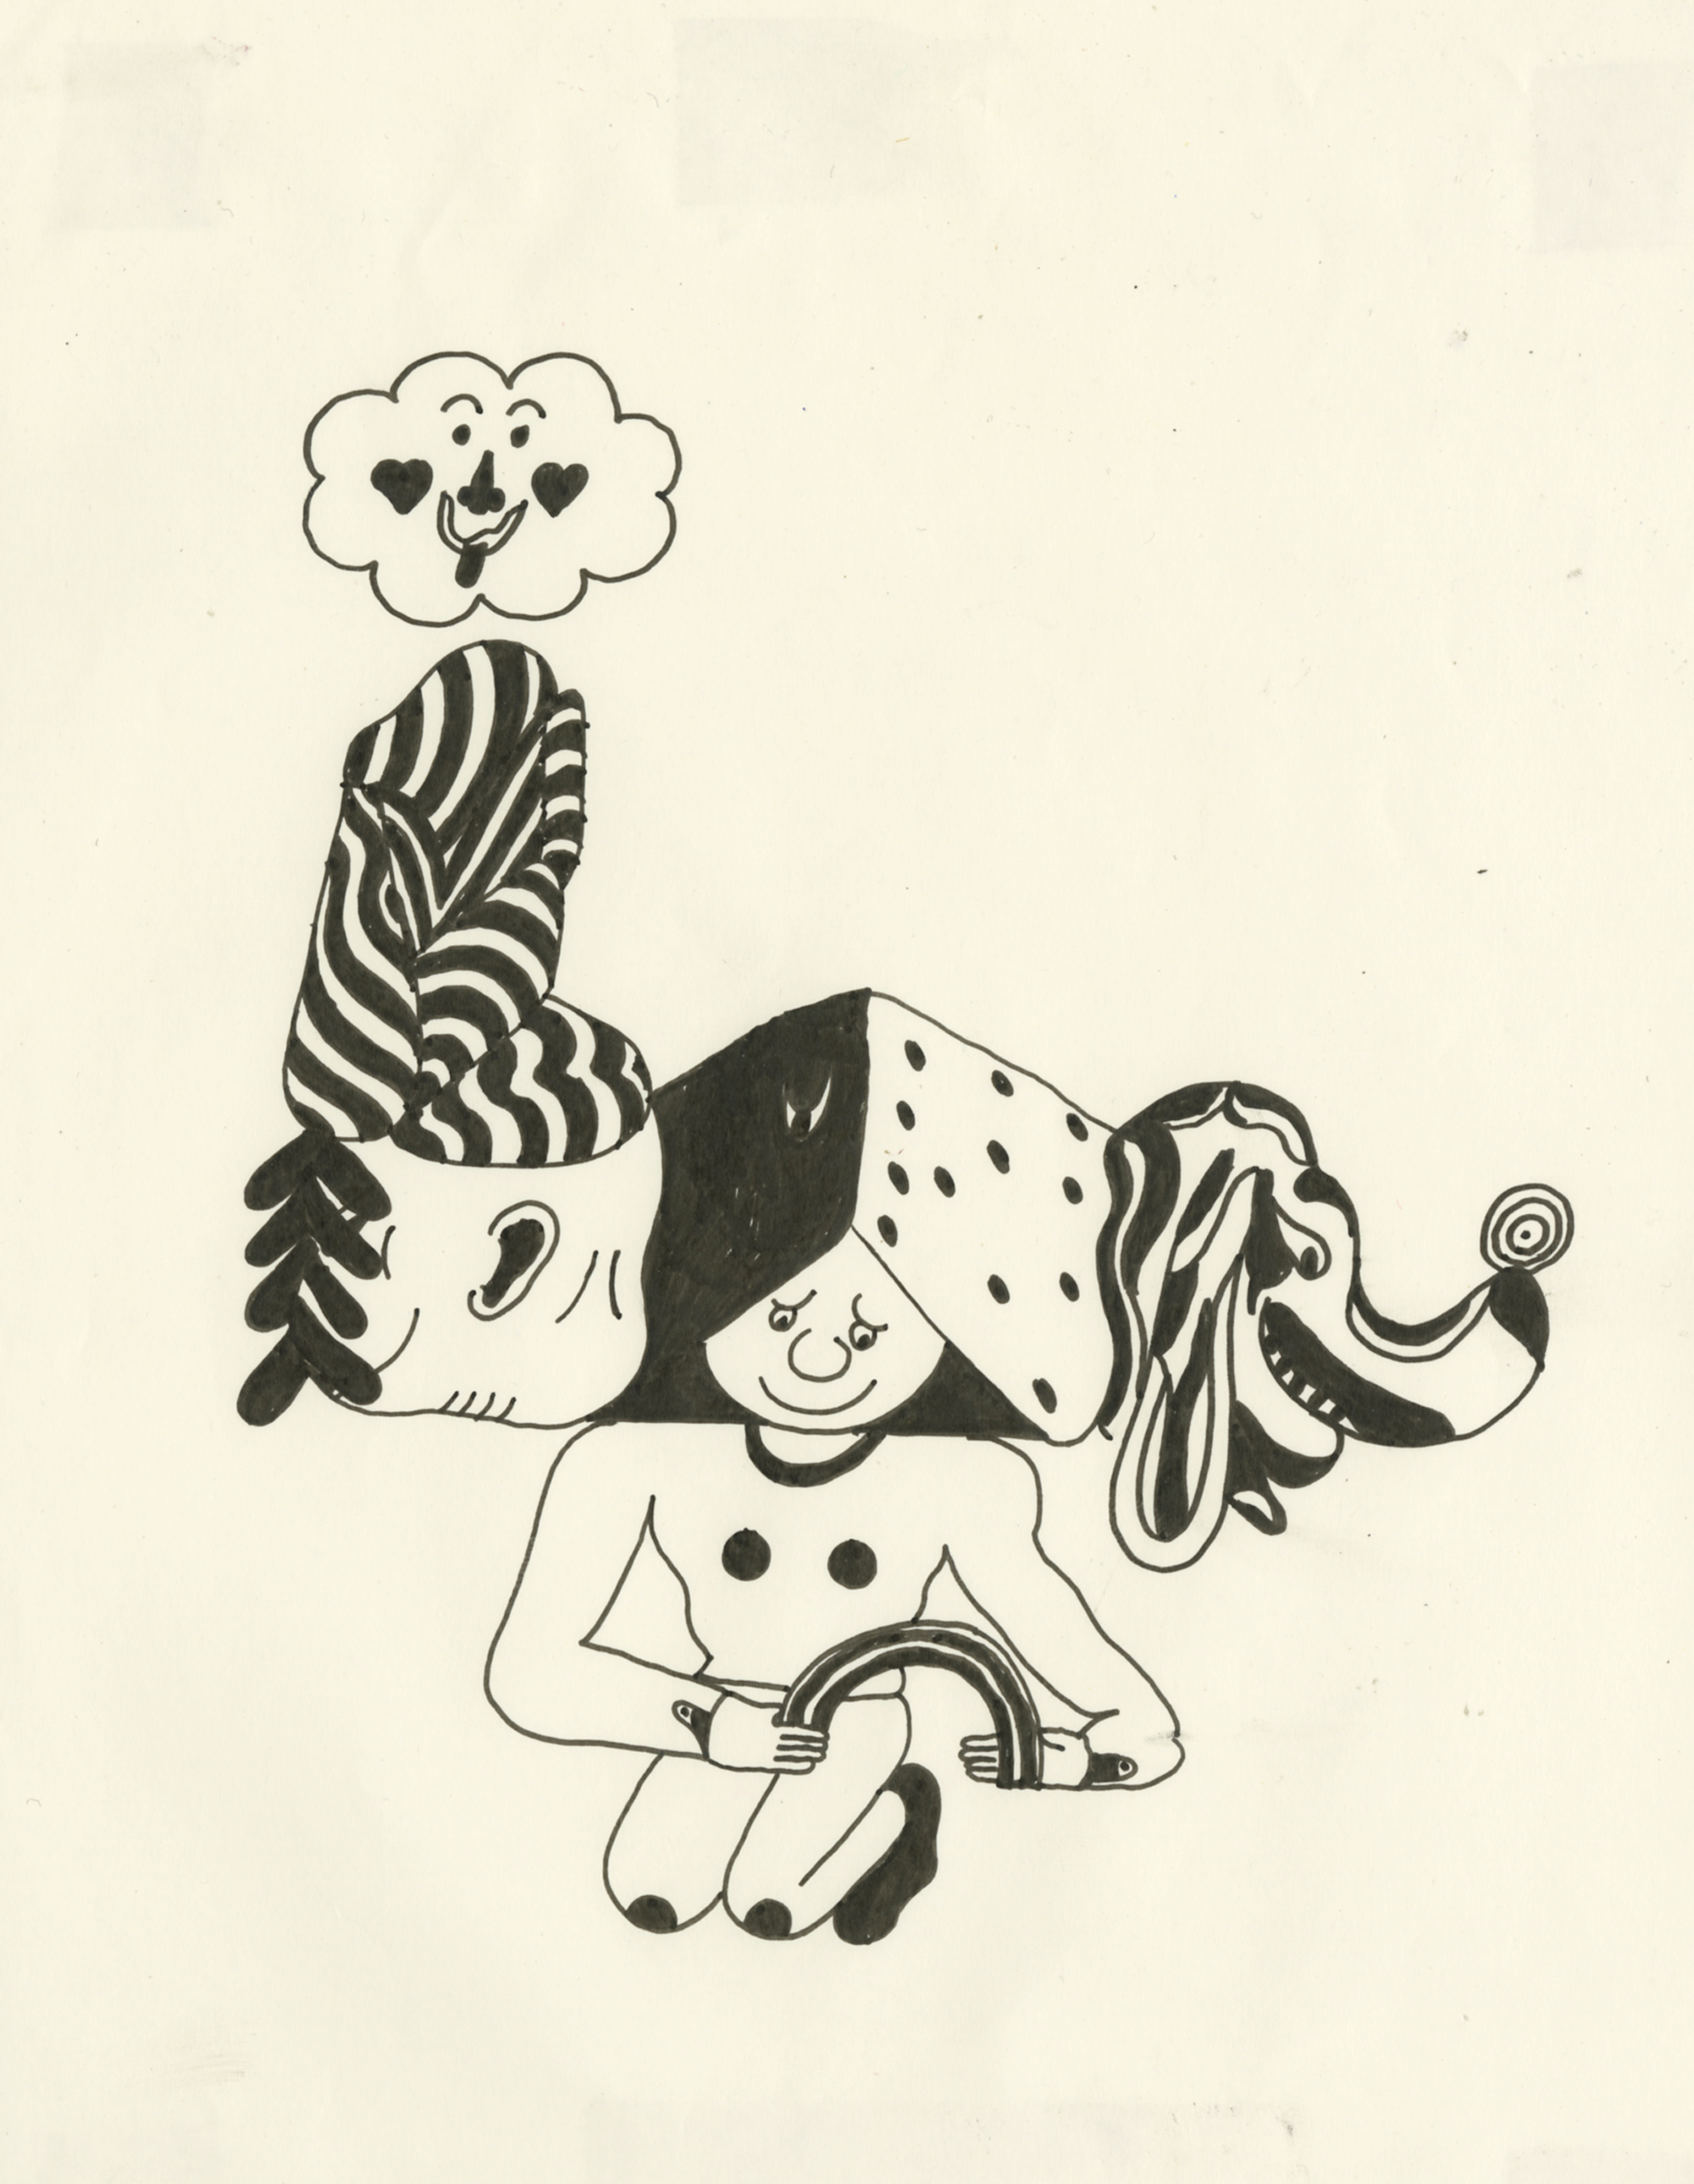 Rainbow Holder .Ink on paper, 2018.